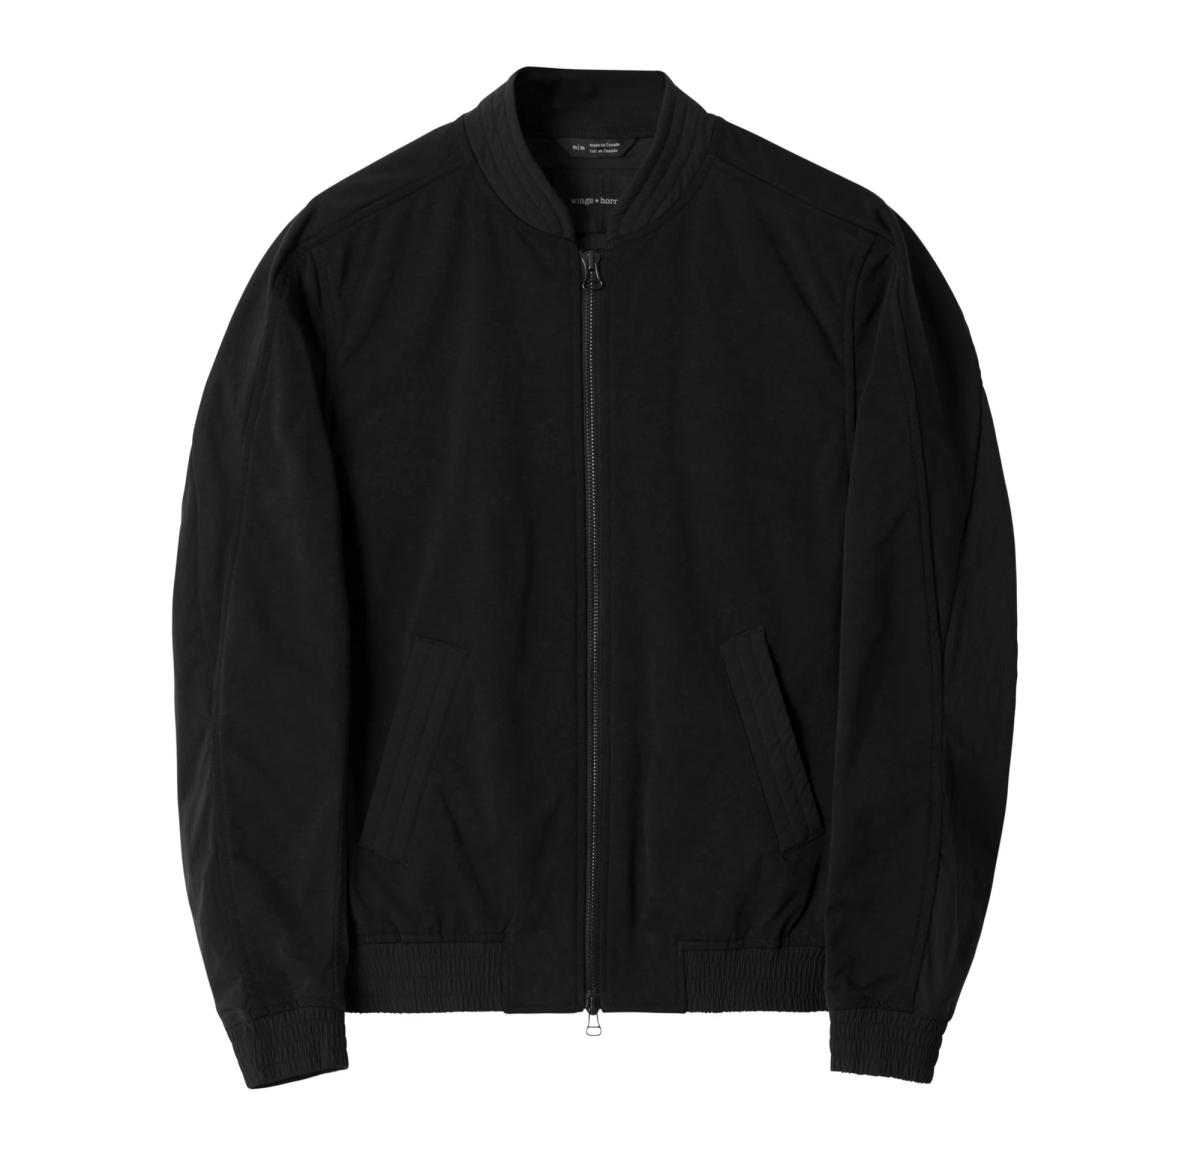 Souvenir Jacket ($317, orig. $446)